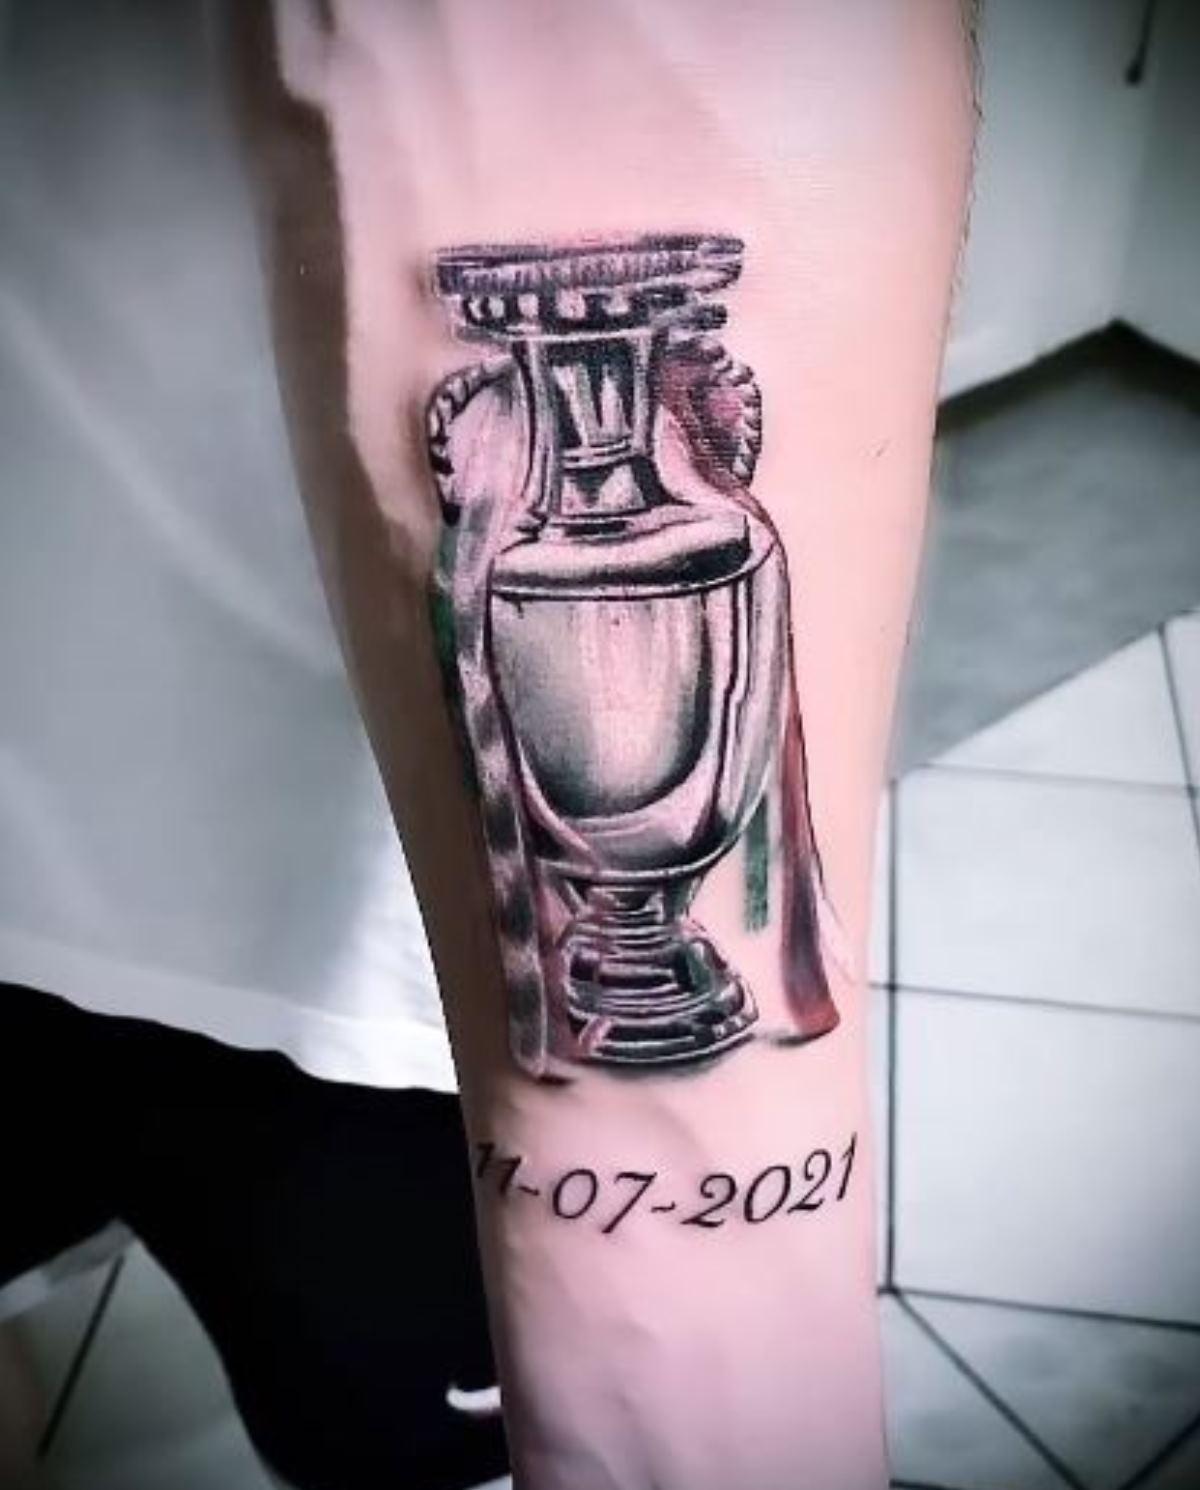 gigio donnarumma tatuaggio europei